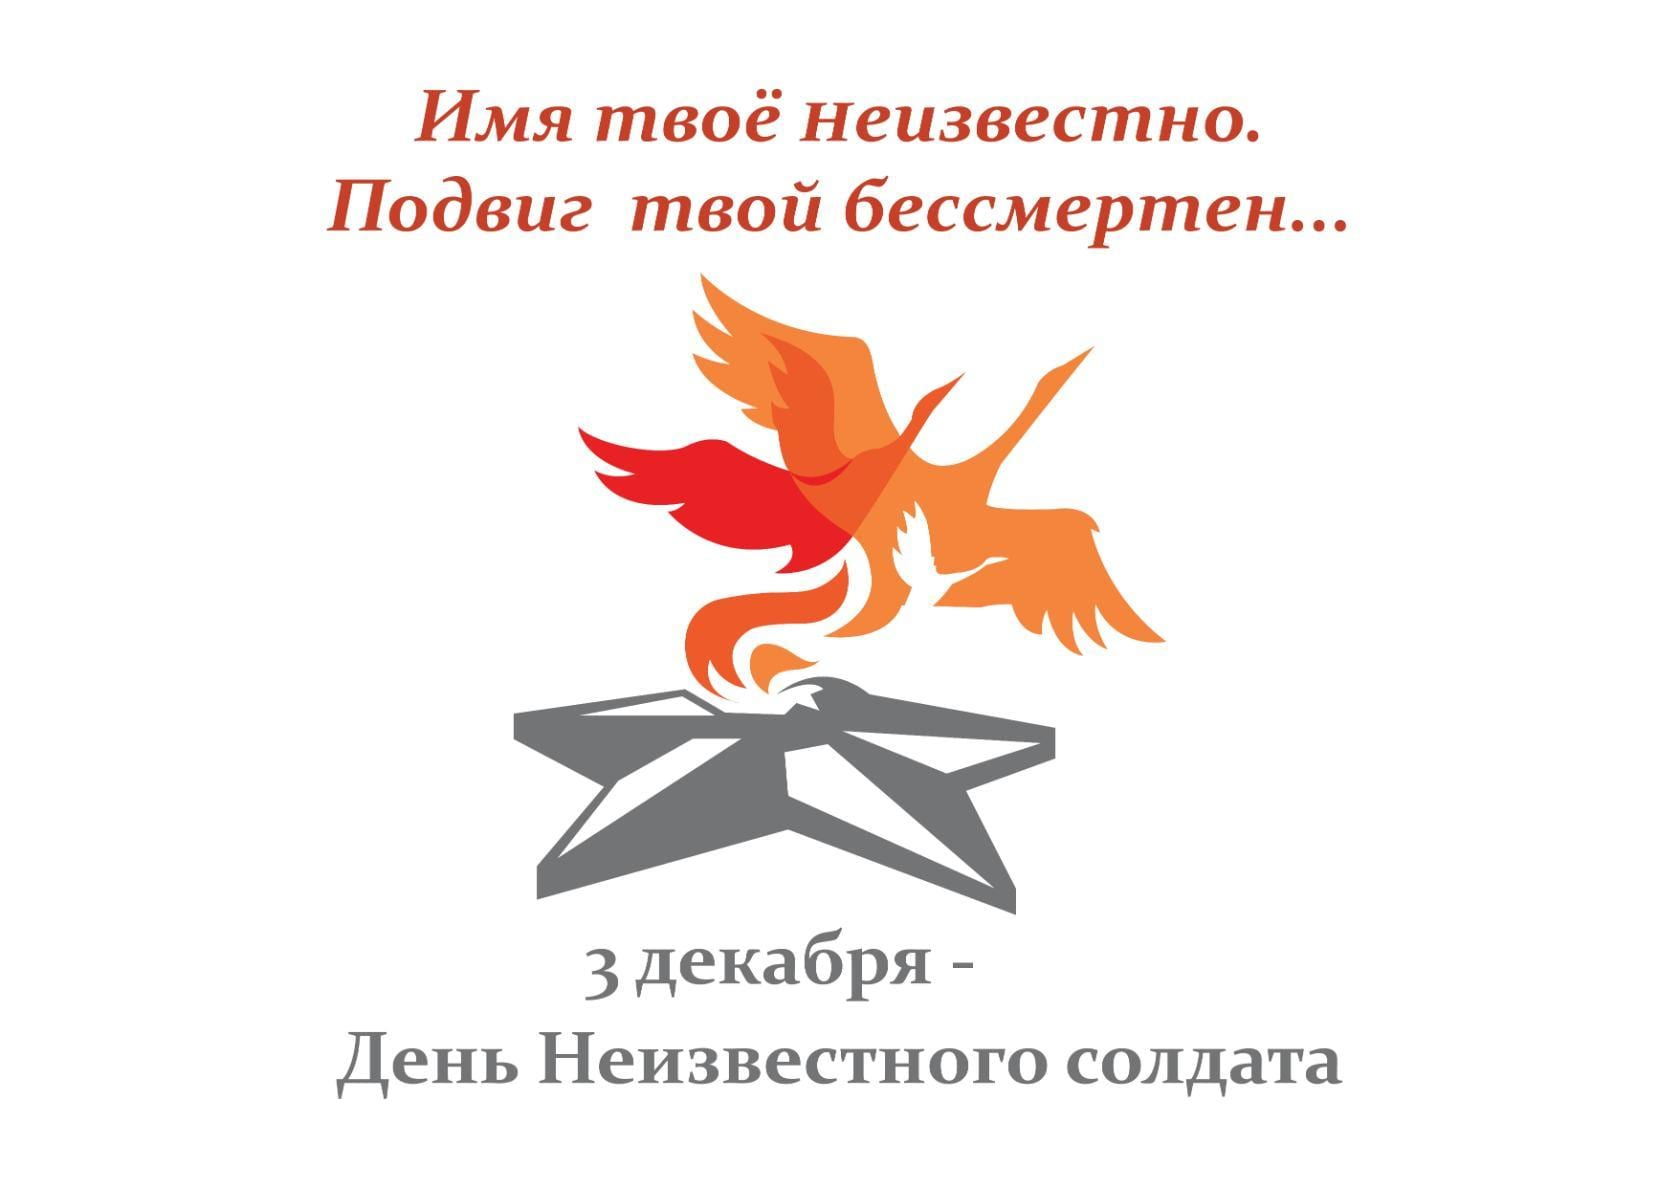 03.12.2018 День неизвестного солдата